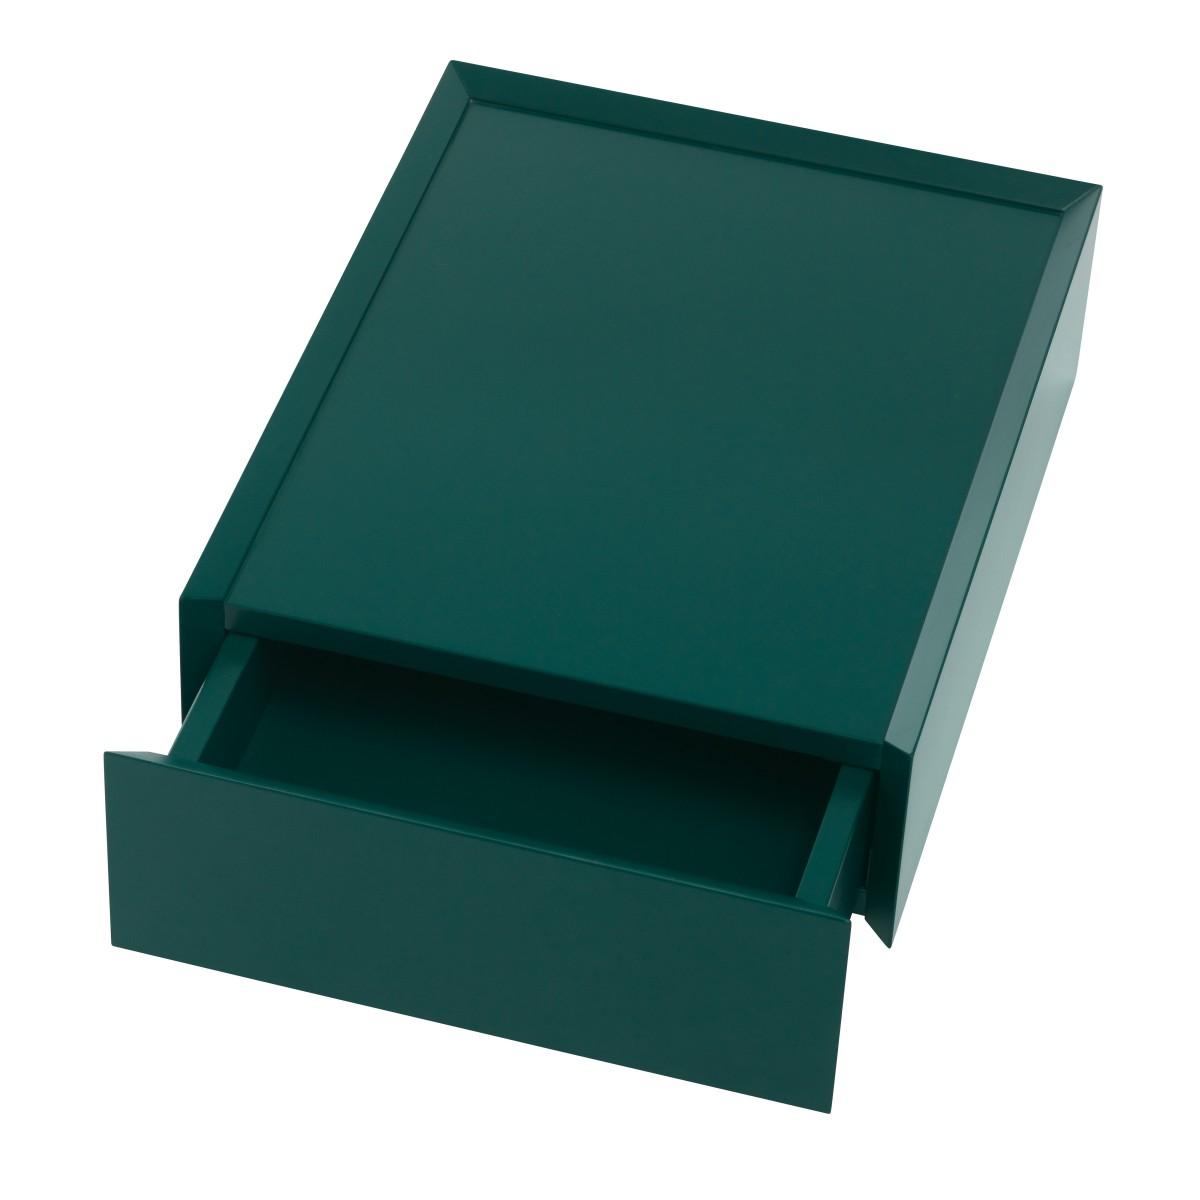 SOUVENIR Schubkastenbox klein smaragdgrün (42), geöffnet